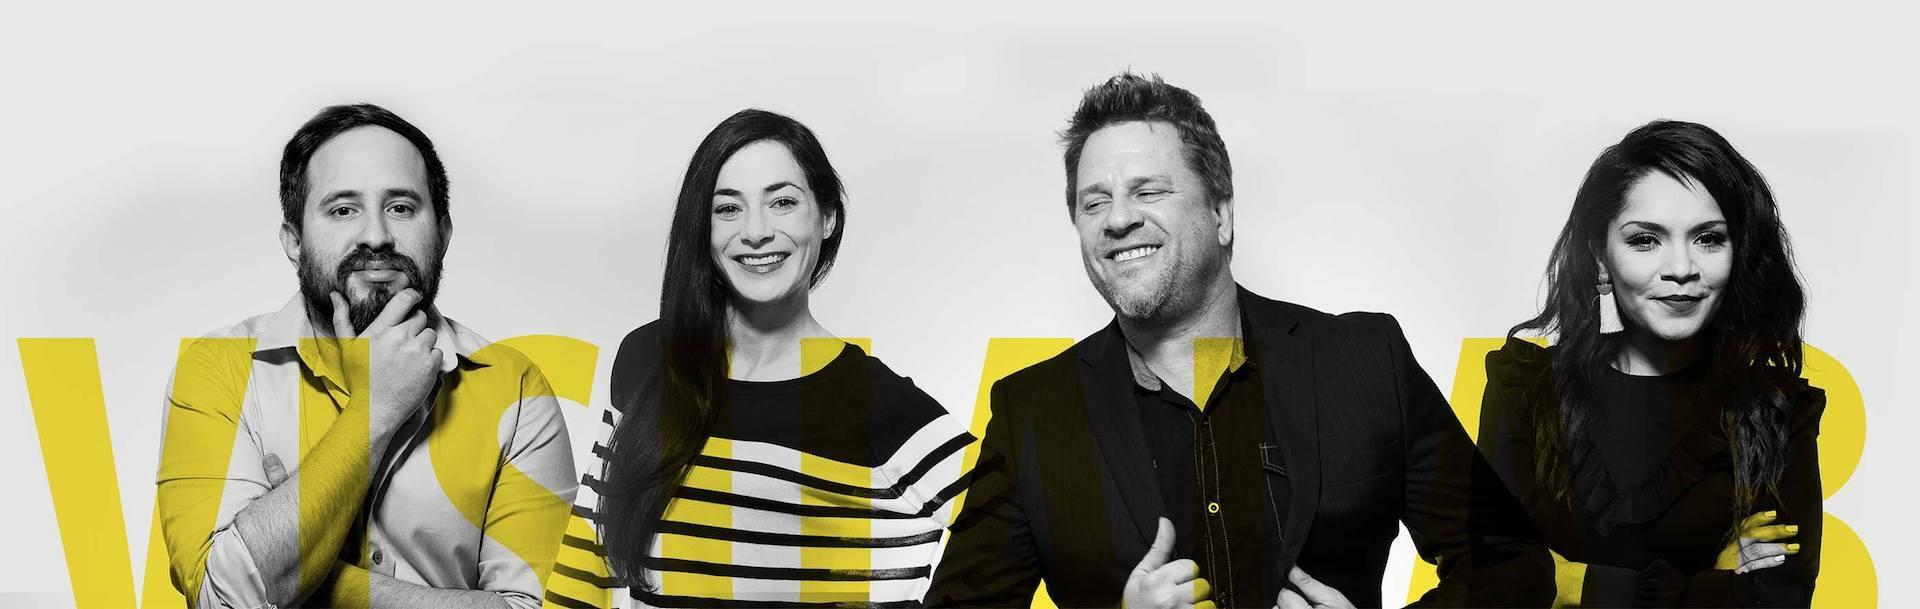 Visualab Design creative marketing agency team leaders